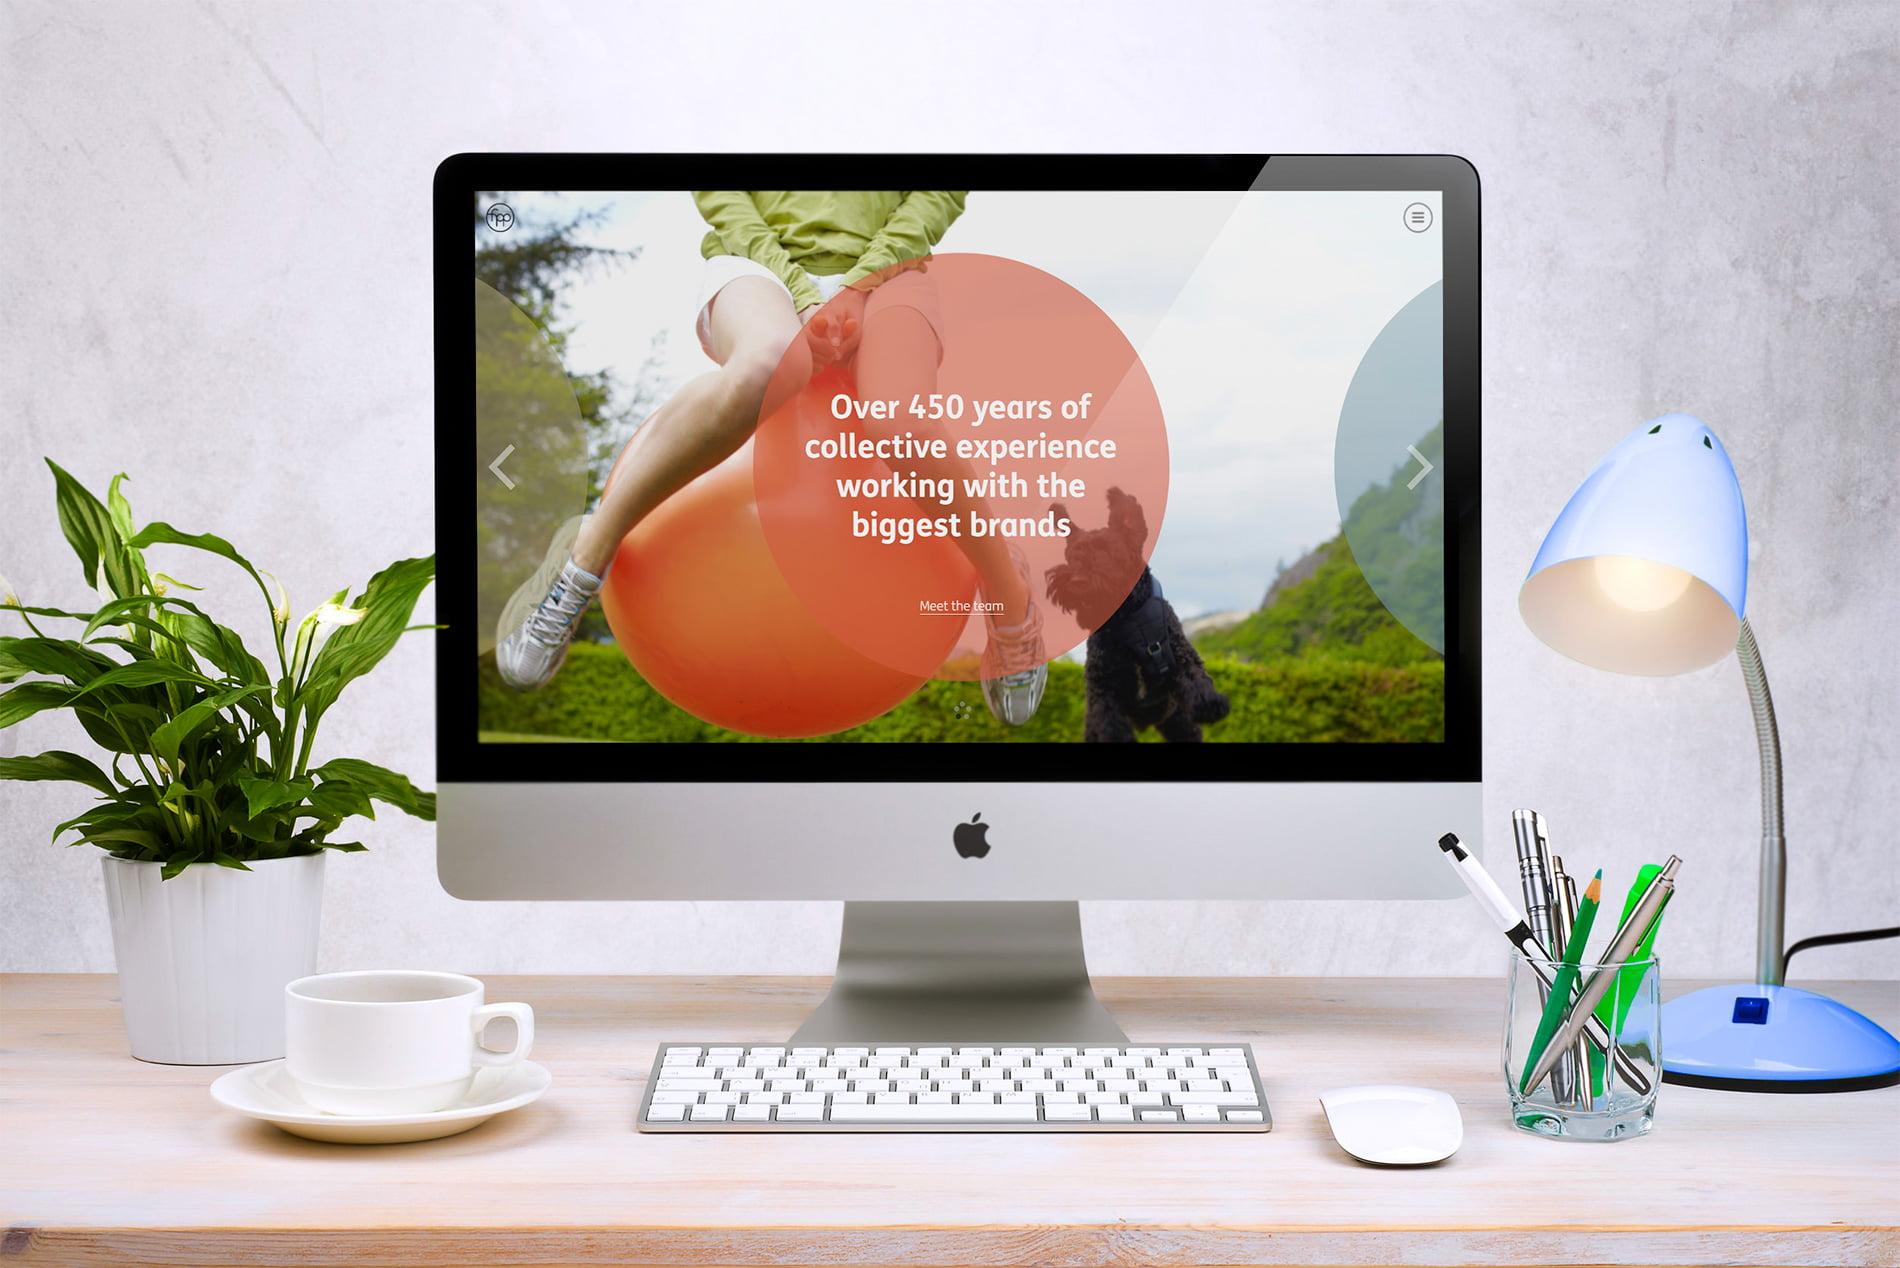 FPP website displayed on desktop